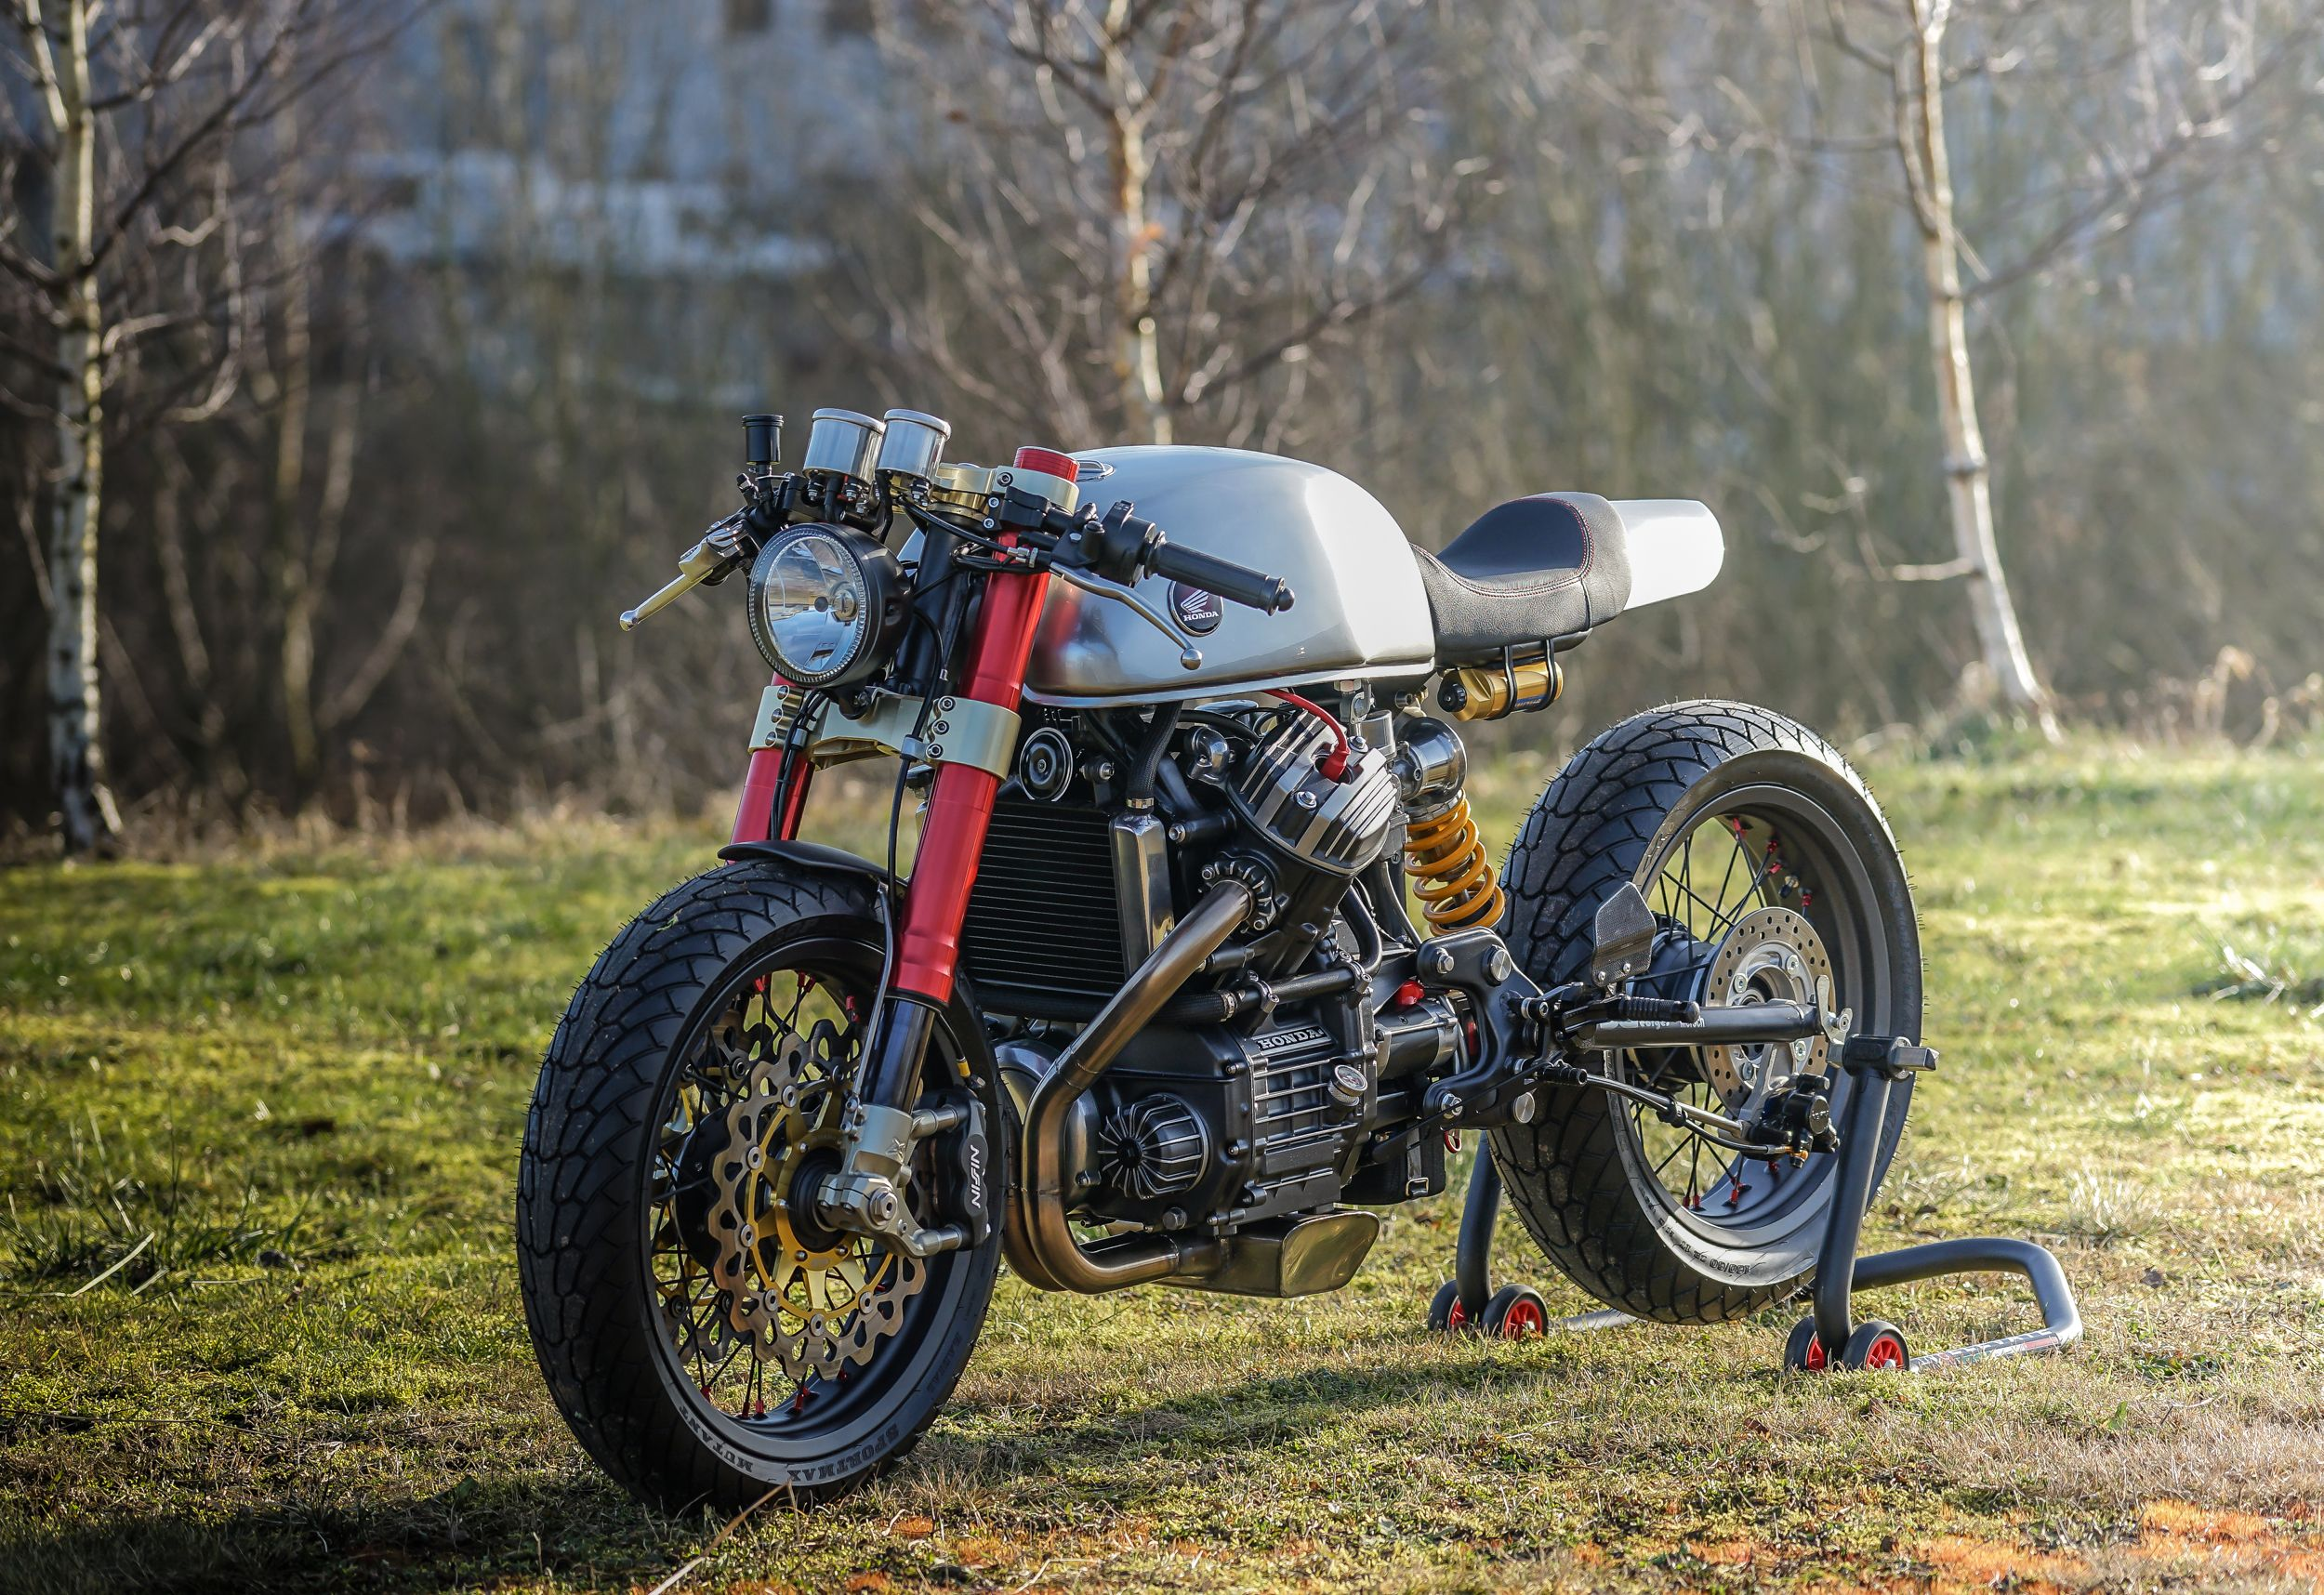 honda cx500 gts - cafe racer projectsacha lakic design 2014